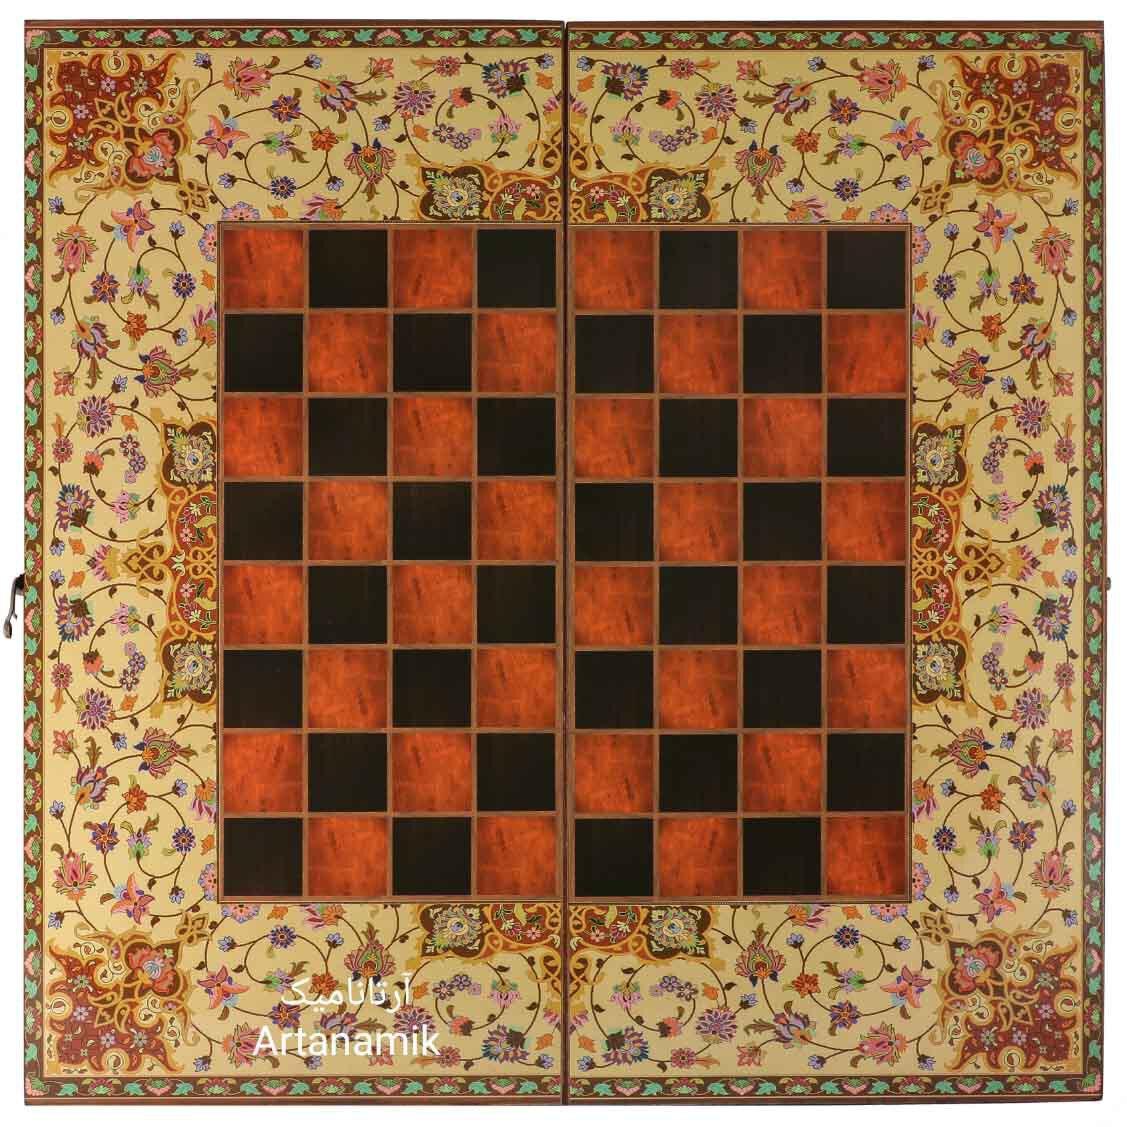 شطرنج کادویی طرح ترنج، شطرنج کادویی، شطرنج نفیس از جنس چوب روس